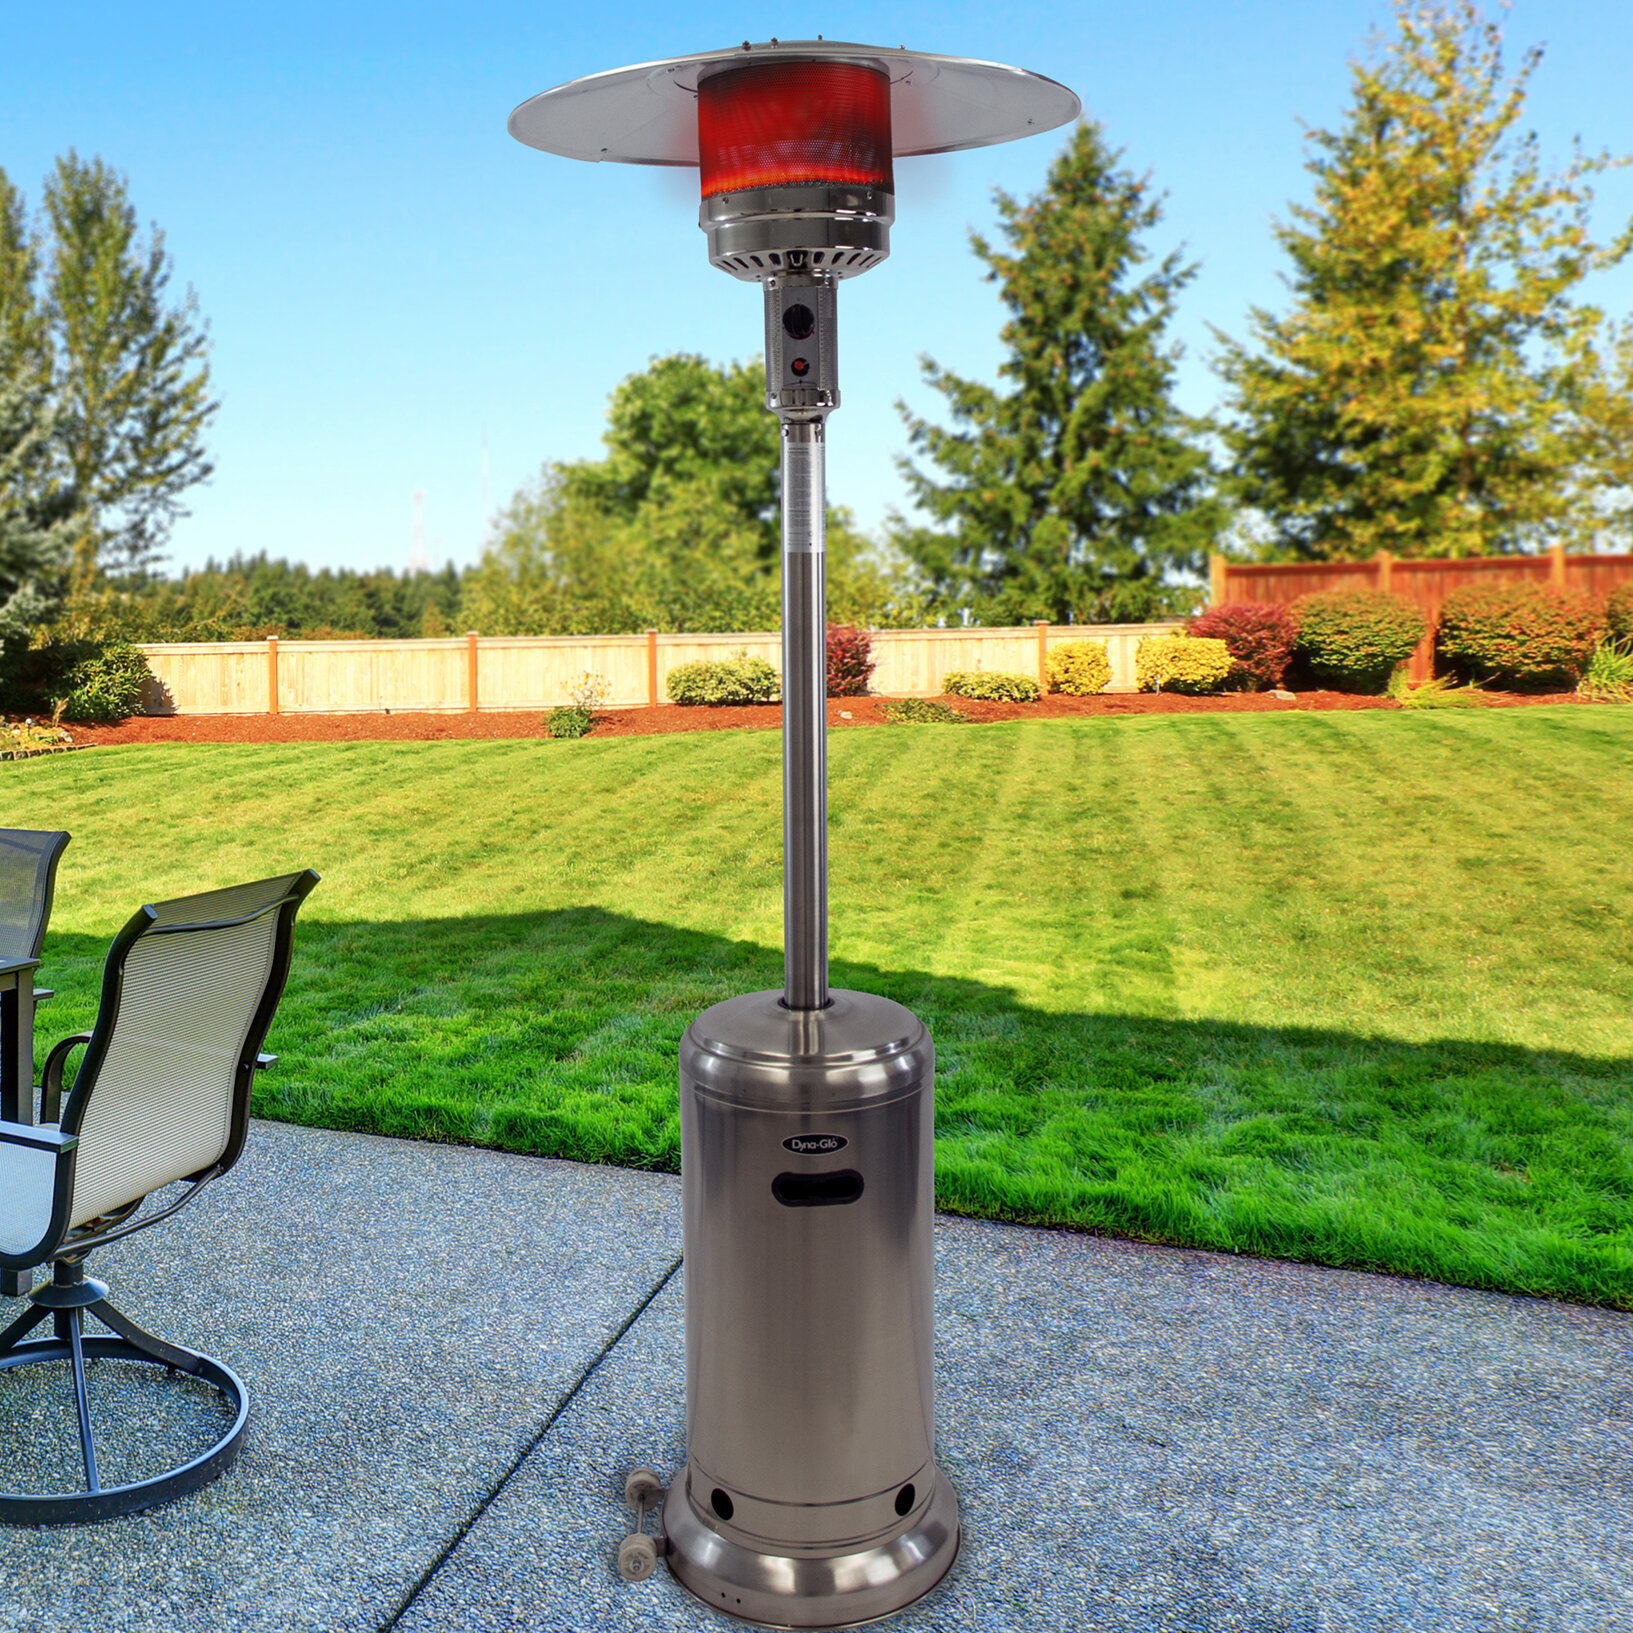 Exceptional Dyna Glo Dyna Glo 41,000 BTU Propane Patio Heater | Wayfair